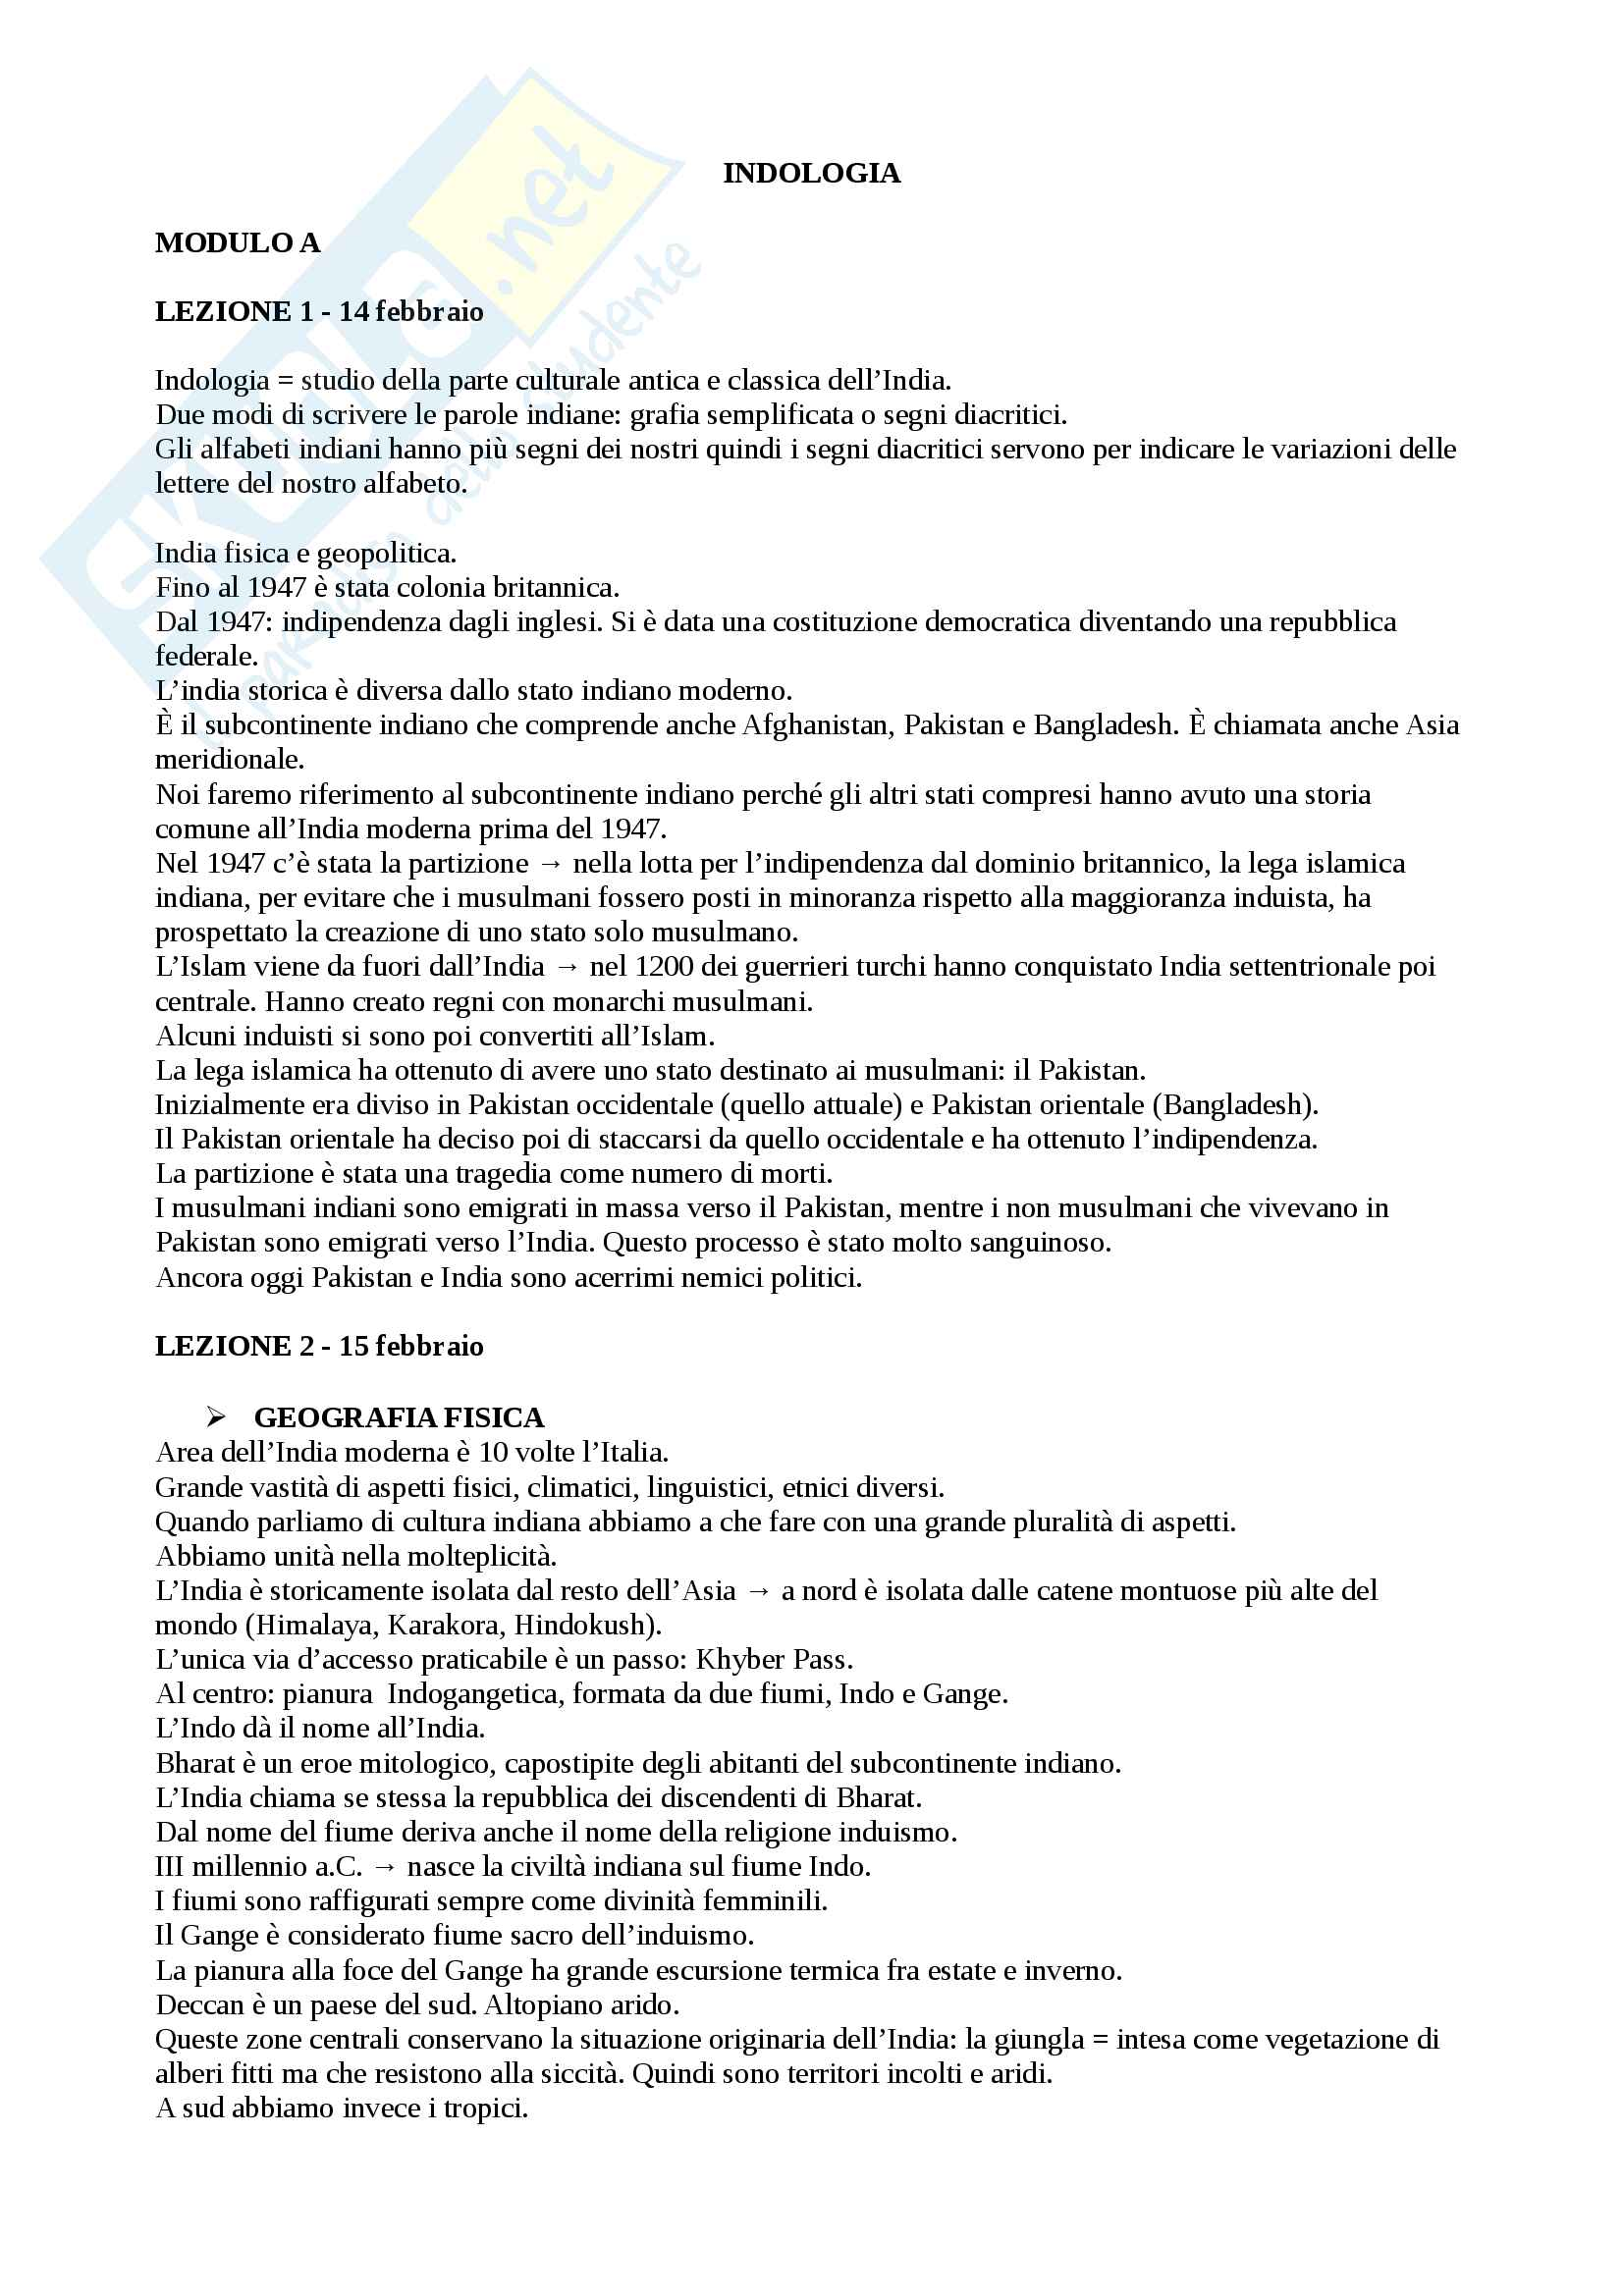 Riassunto per esame di indologia, prof. Pieruccini